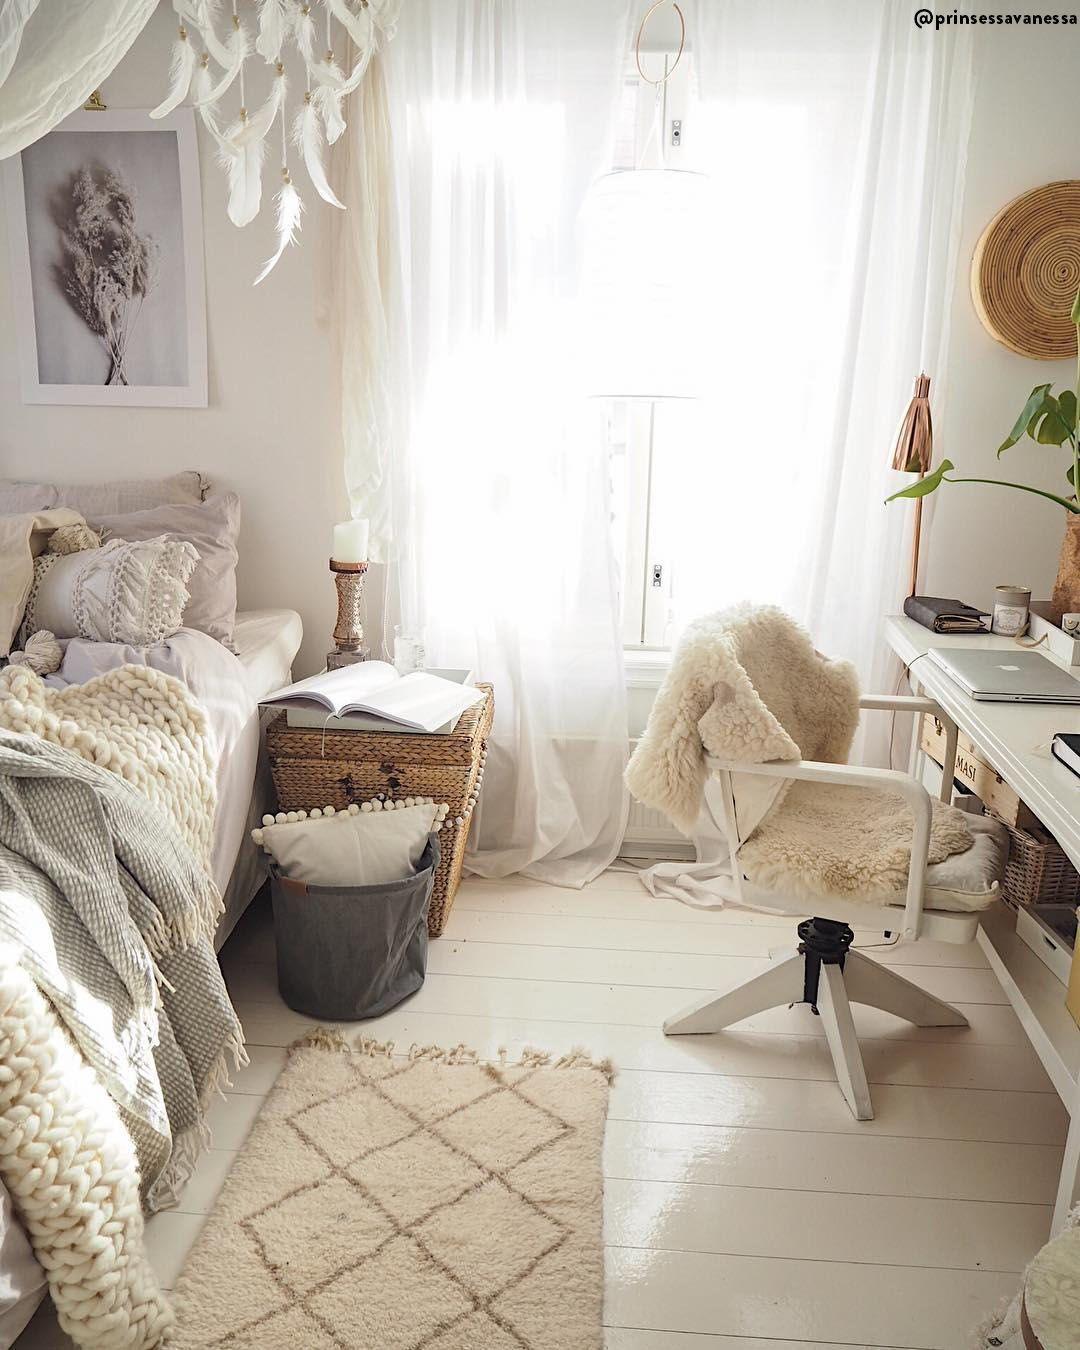 Natural Living   Rattan, Holz, Leinen & Co. in 2020   Zimmer einrichten, Tumblr zimmer ...